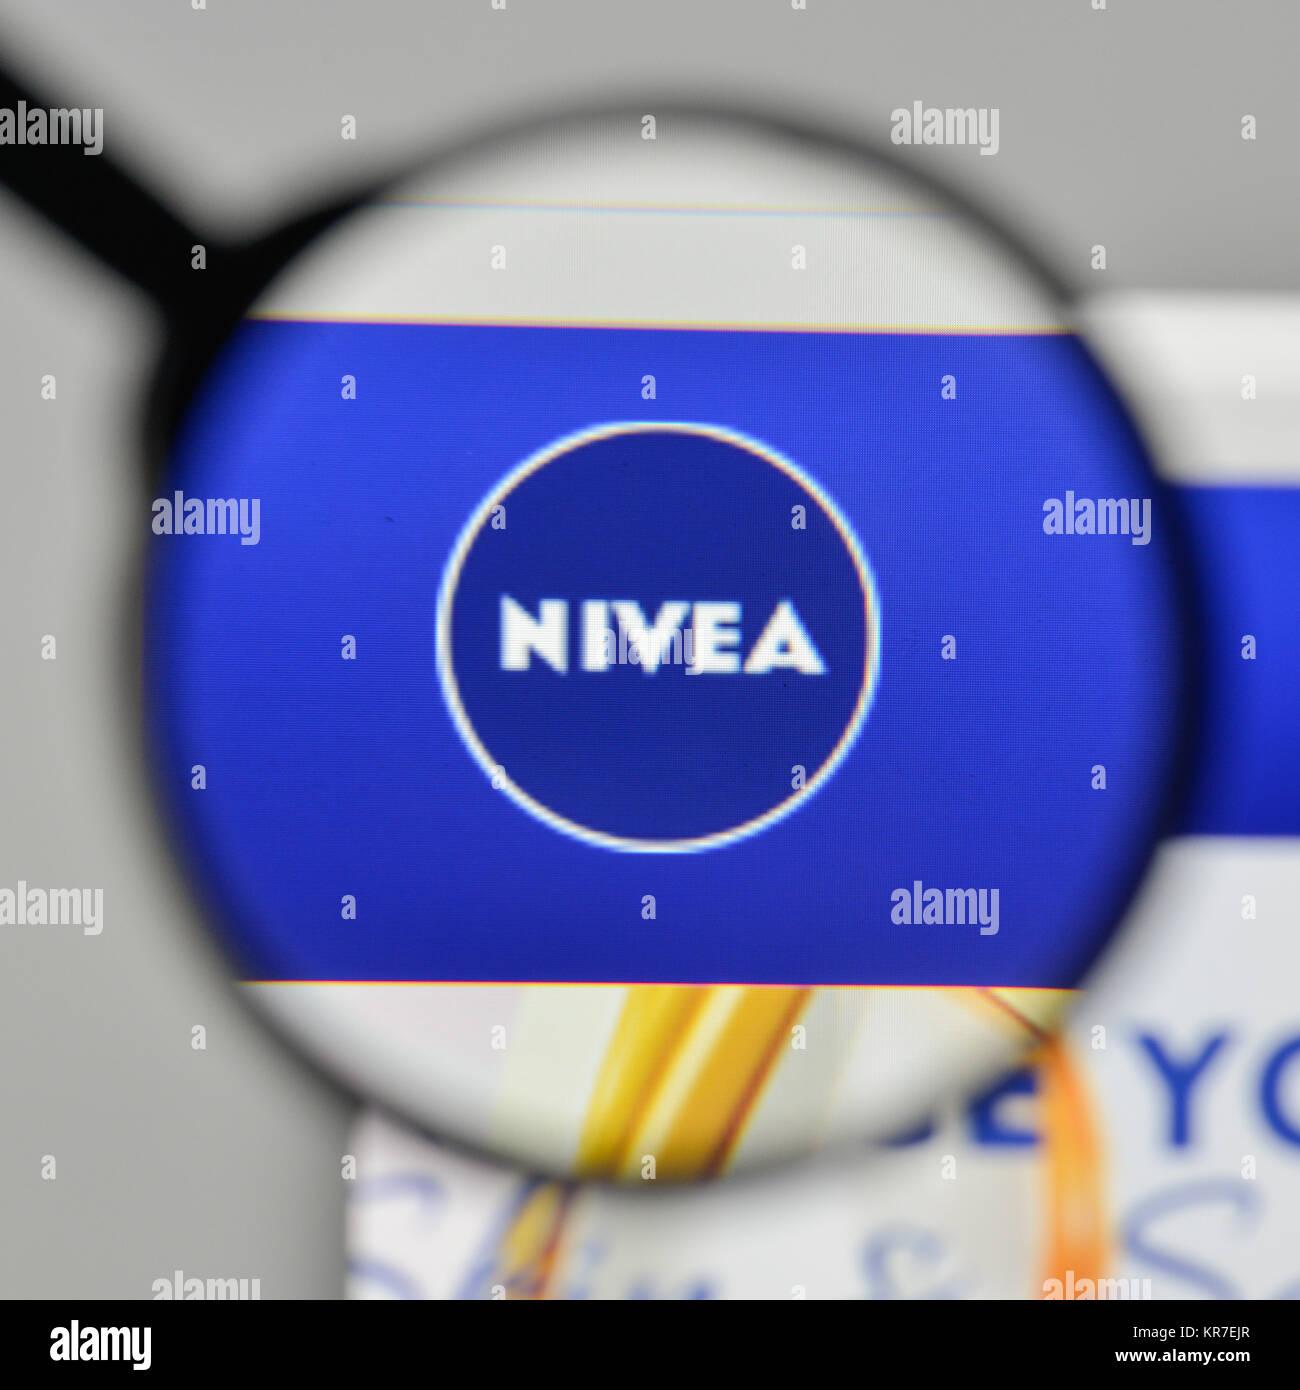 Milan, Italy - November 1, 2017: Nivea logo on the website homepage. - Stock Image